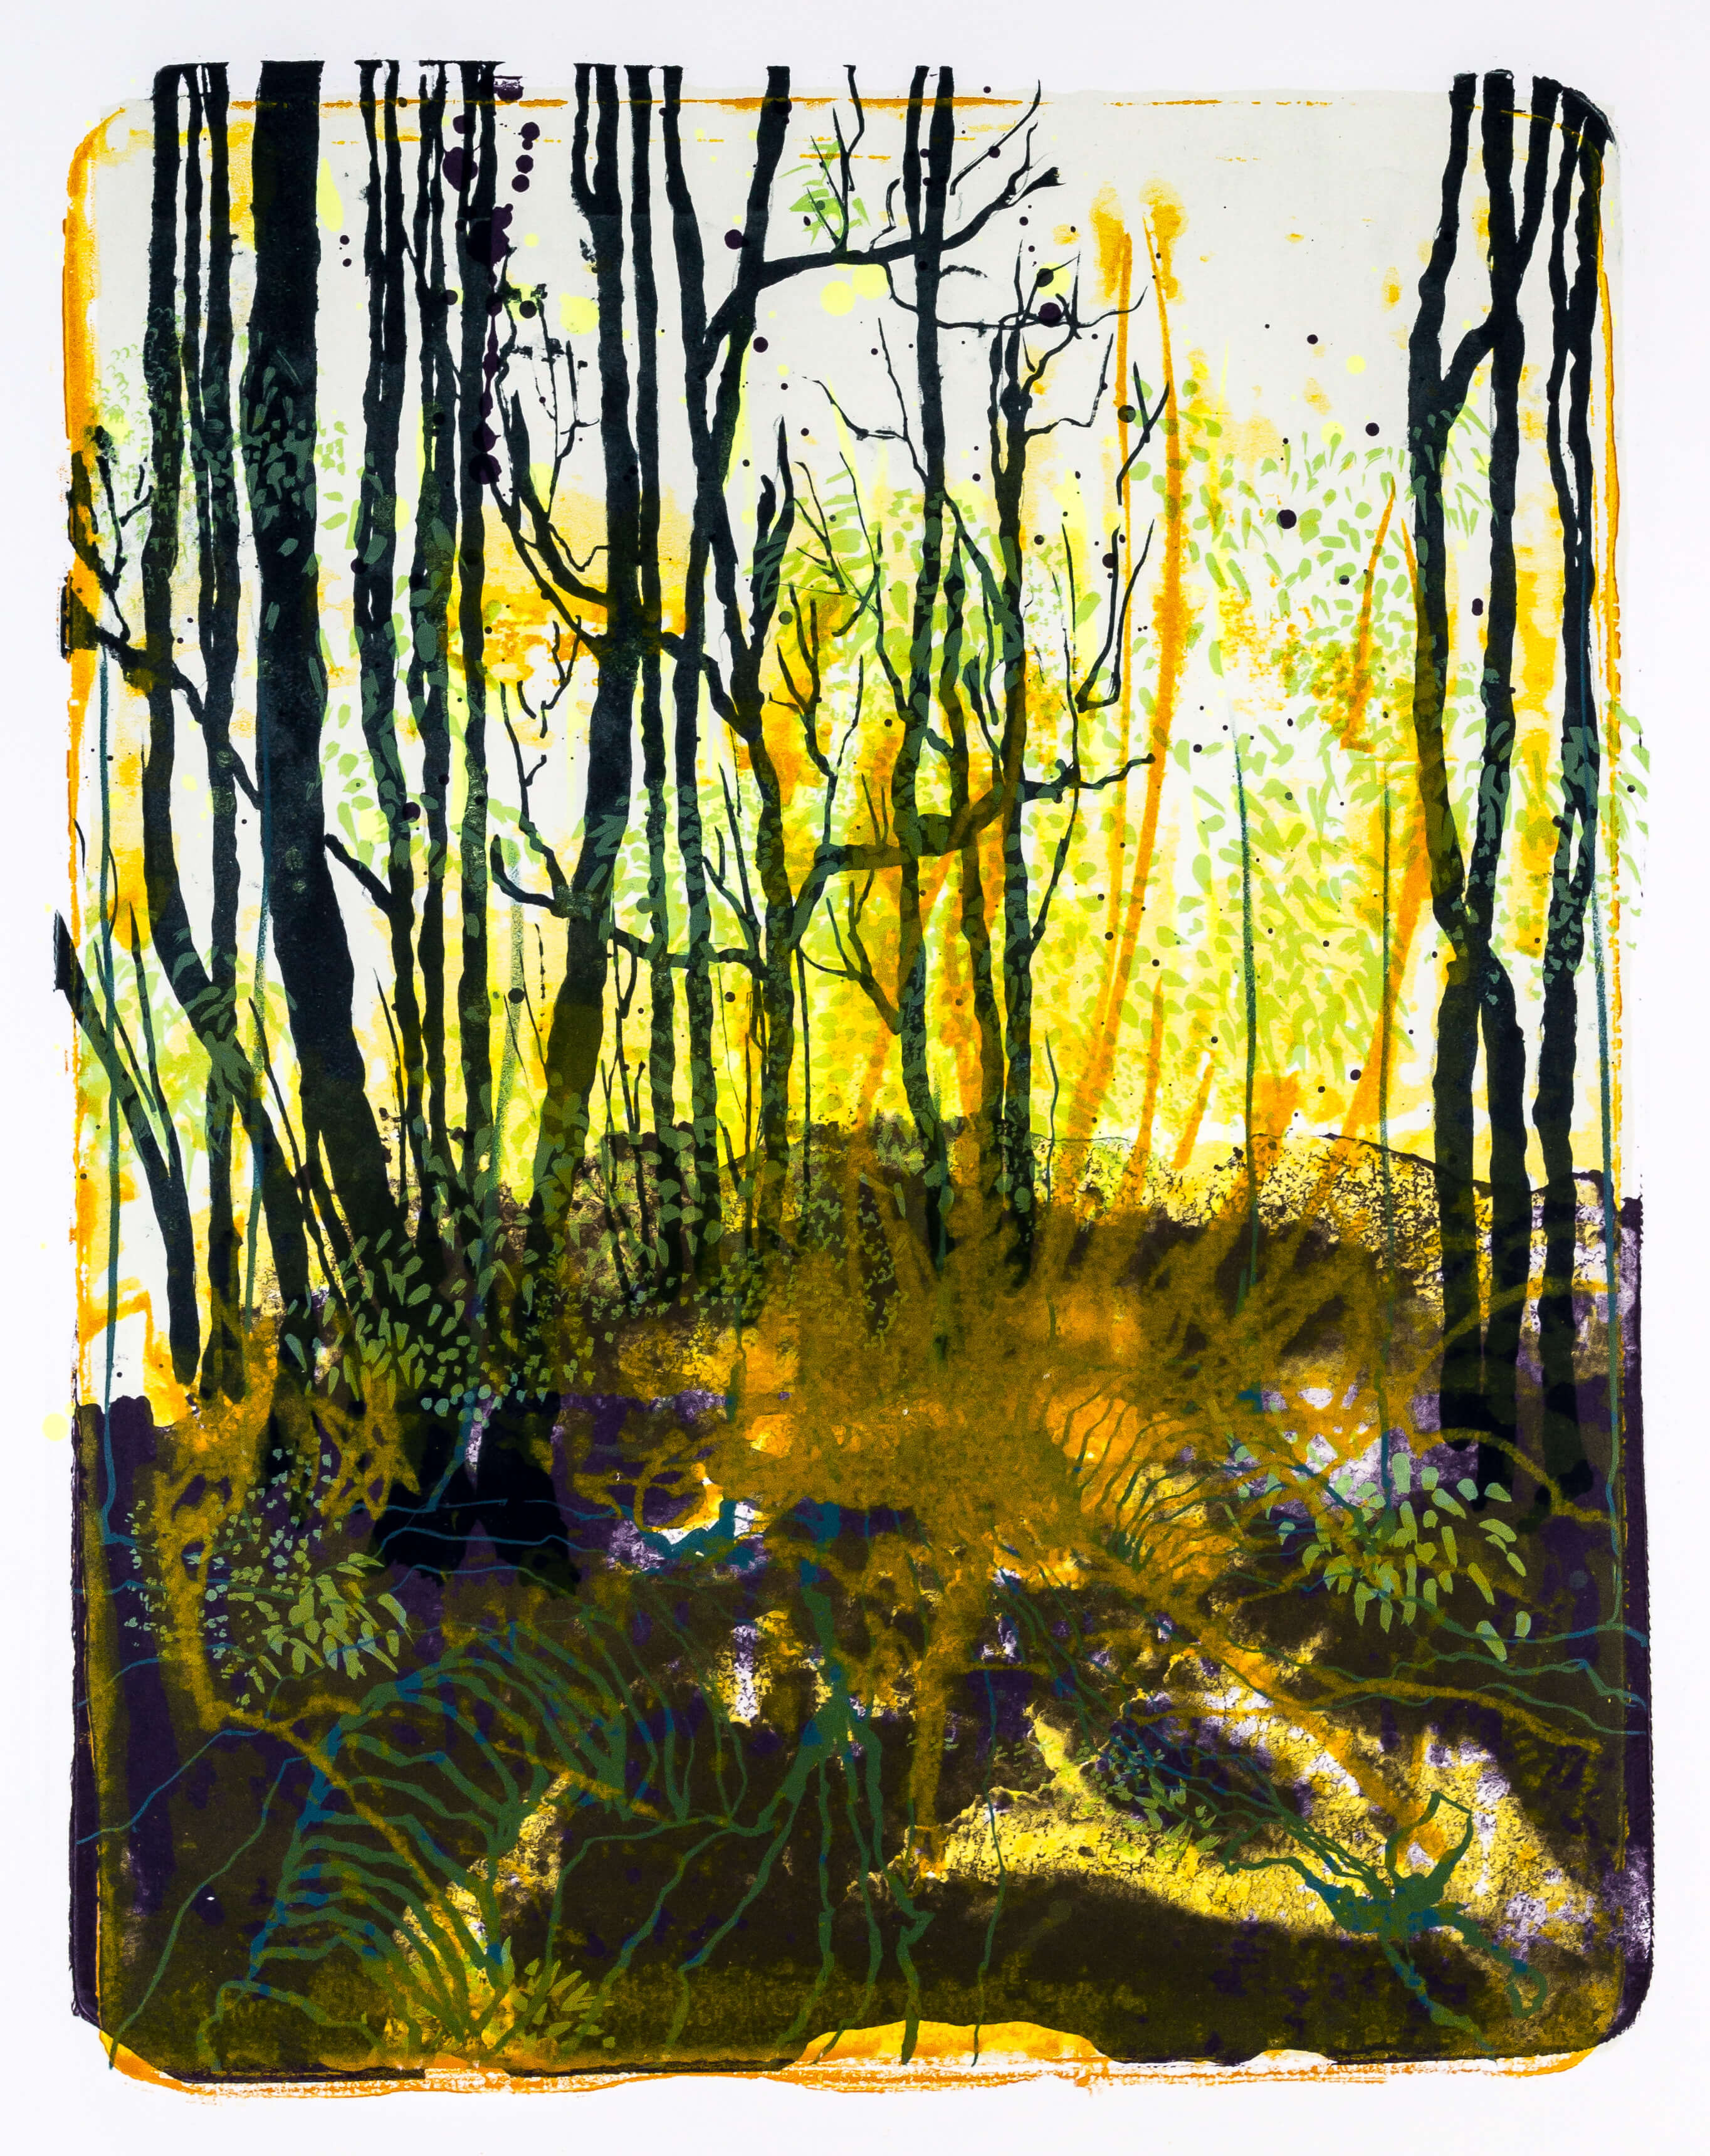 Katharina Albers, Wald X-X, 2015, Farblithographie, Unikat, 50×40 cm